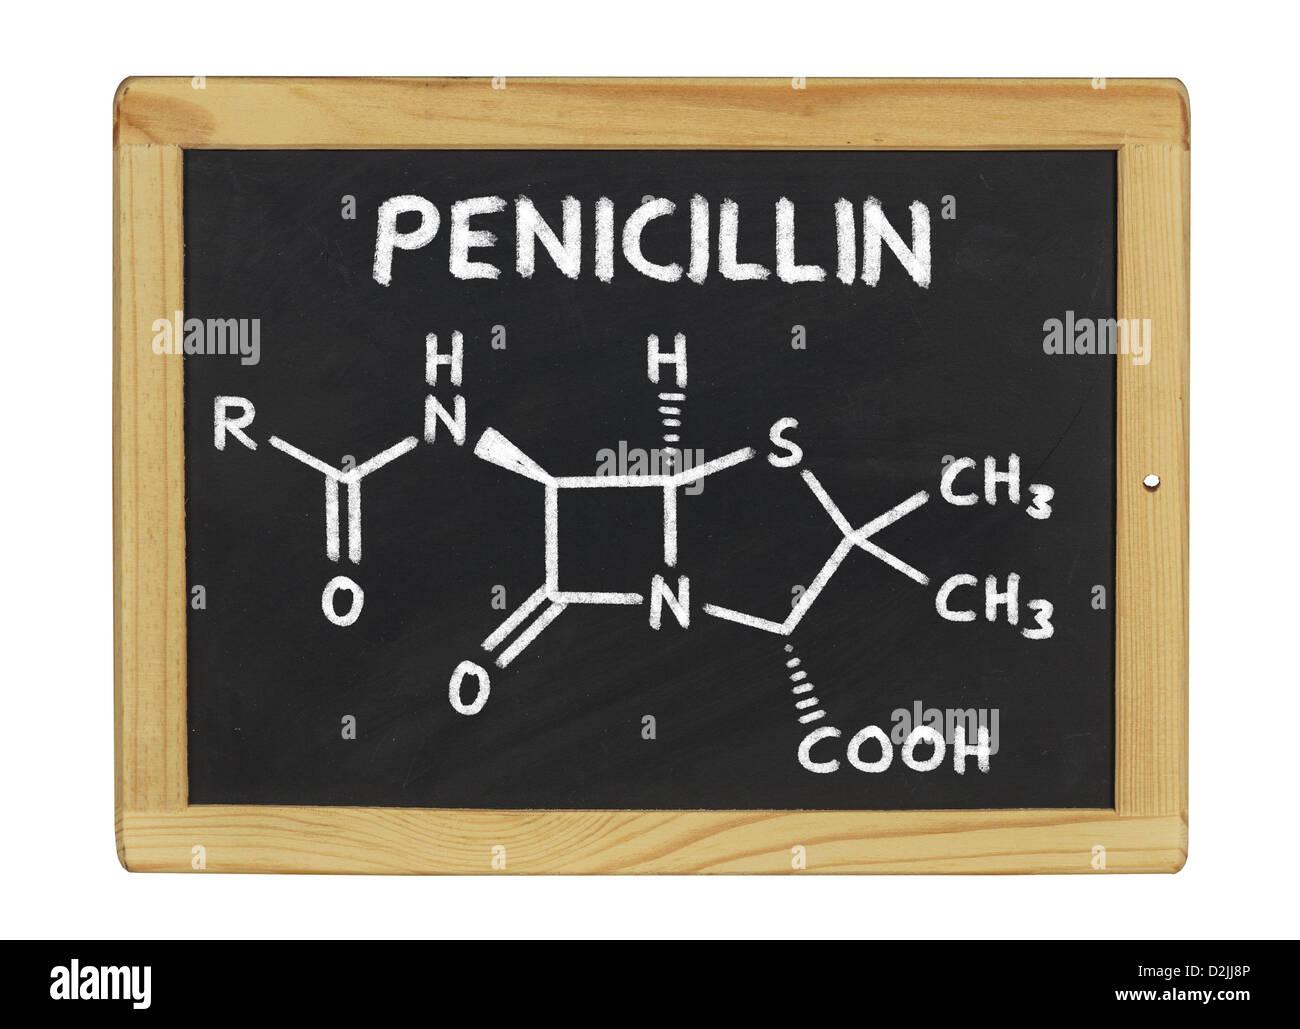 chemical formula of penicillin on a blackboard - Stock Image